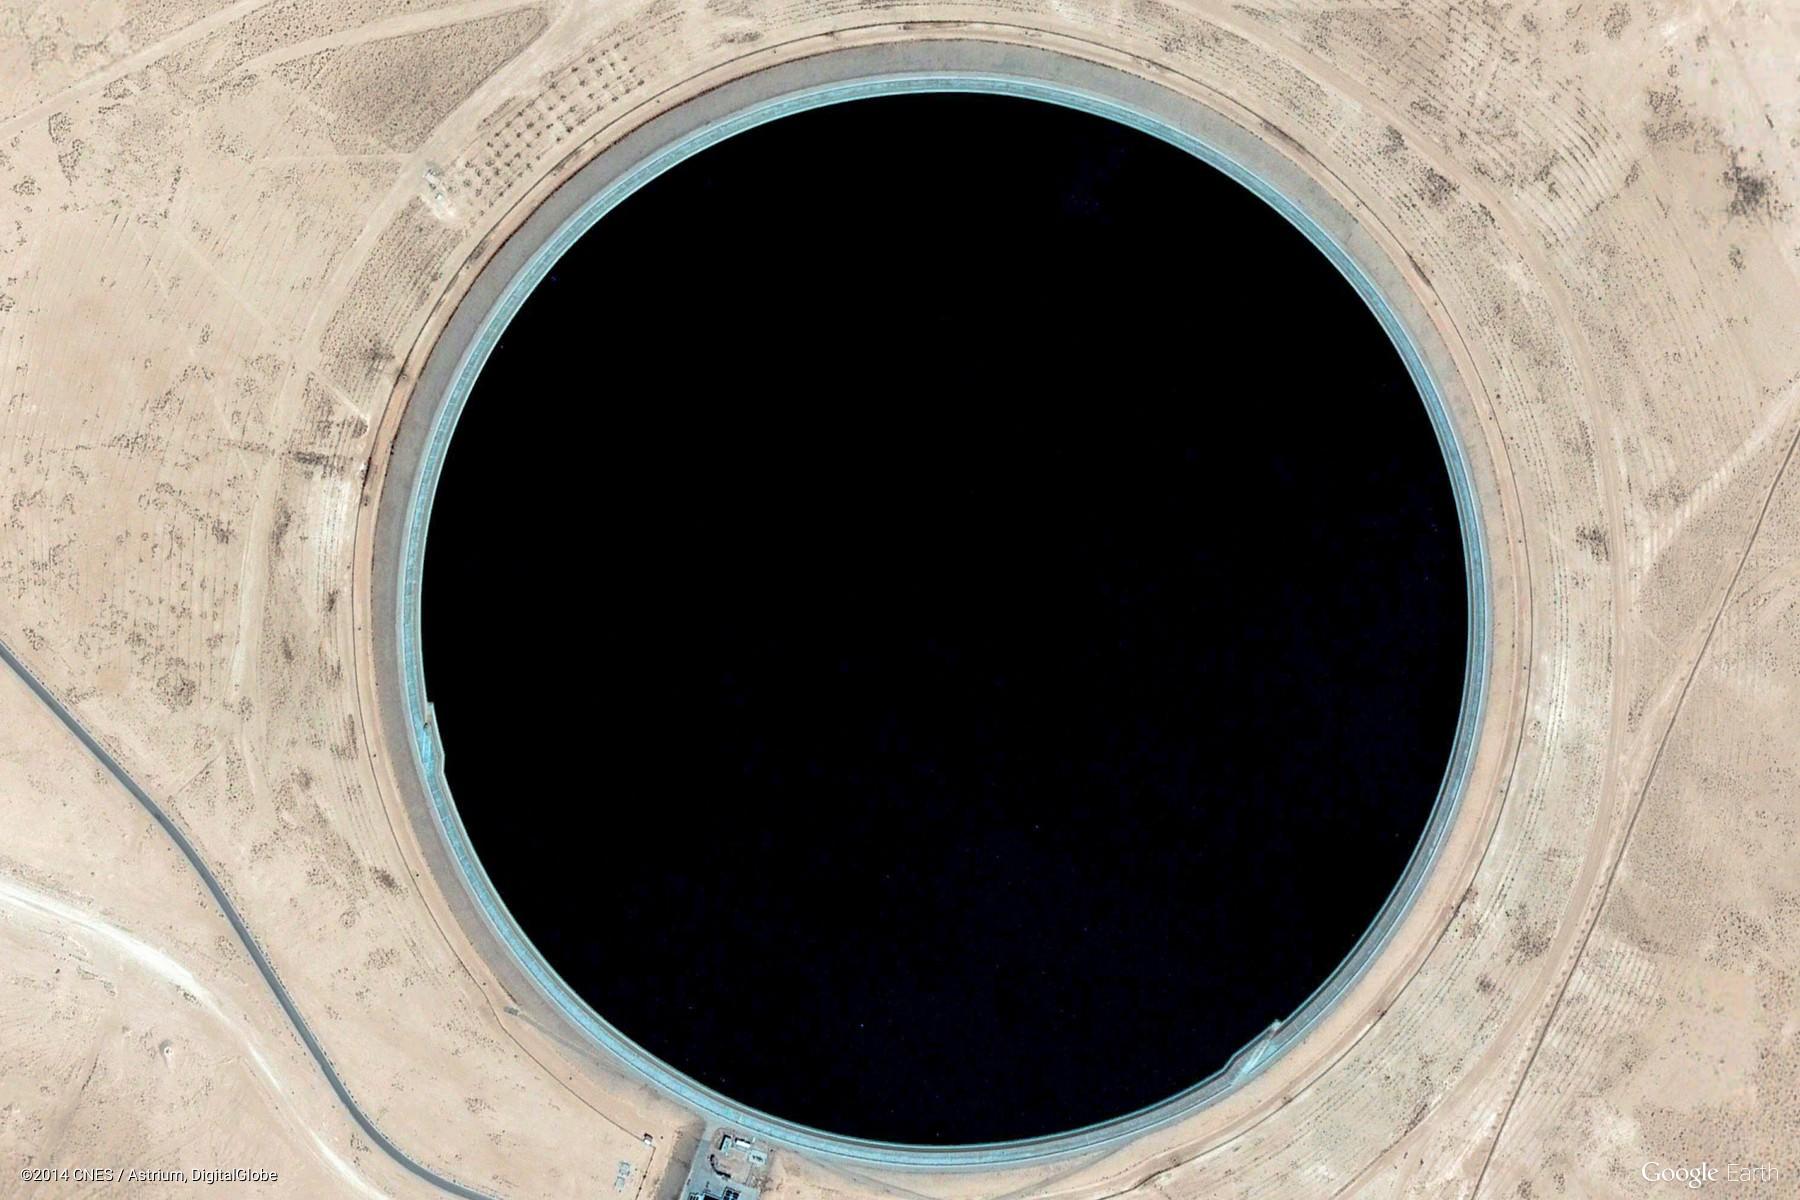 AL Wahat, Libia